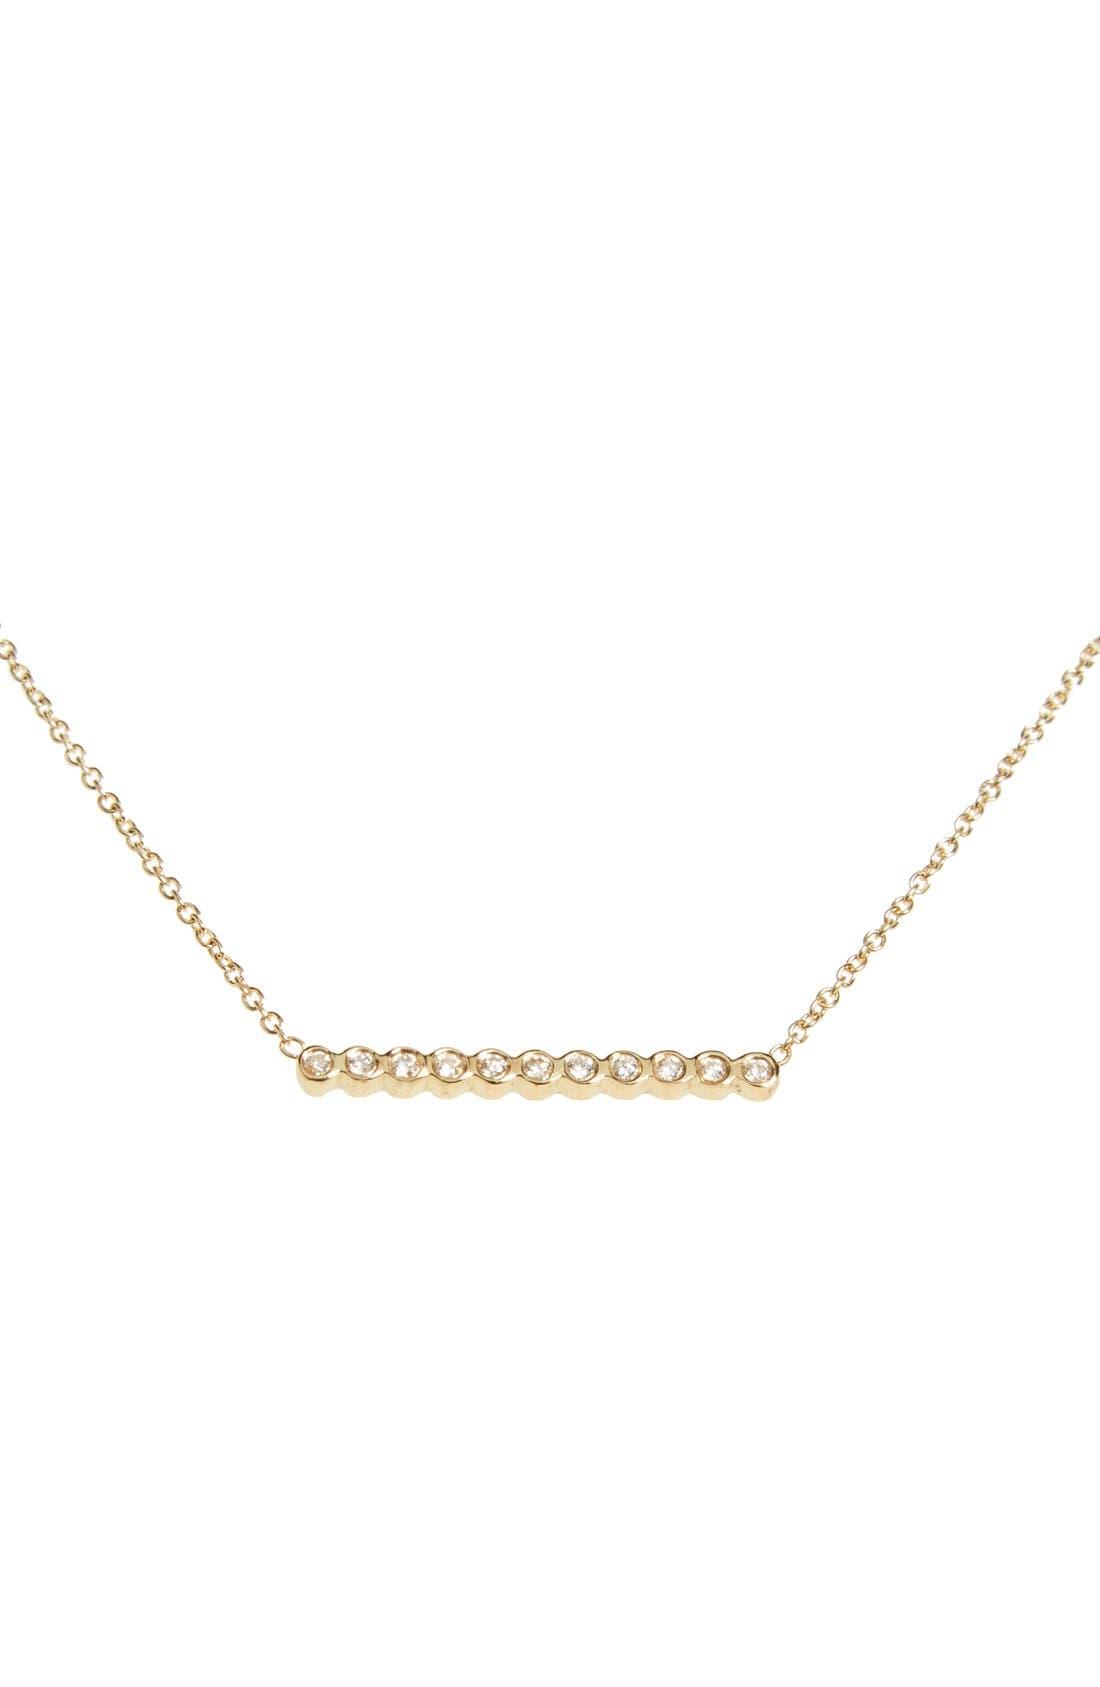 Diamond Bar Pendant Necklace,                         Main,                         color, YELLOW GOLD